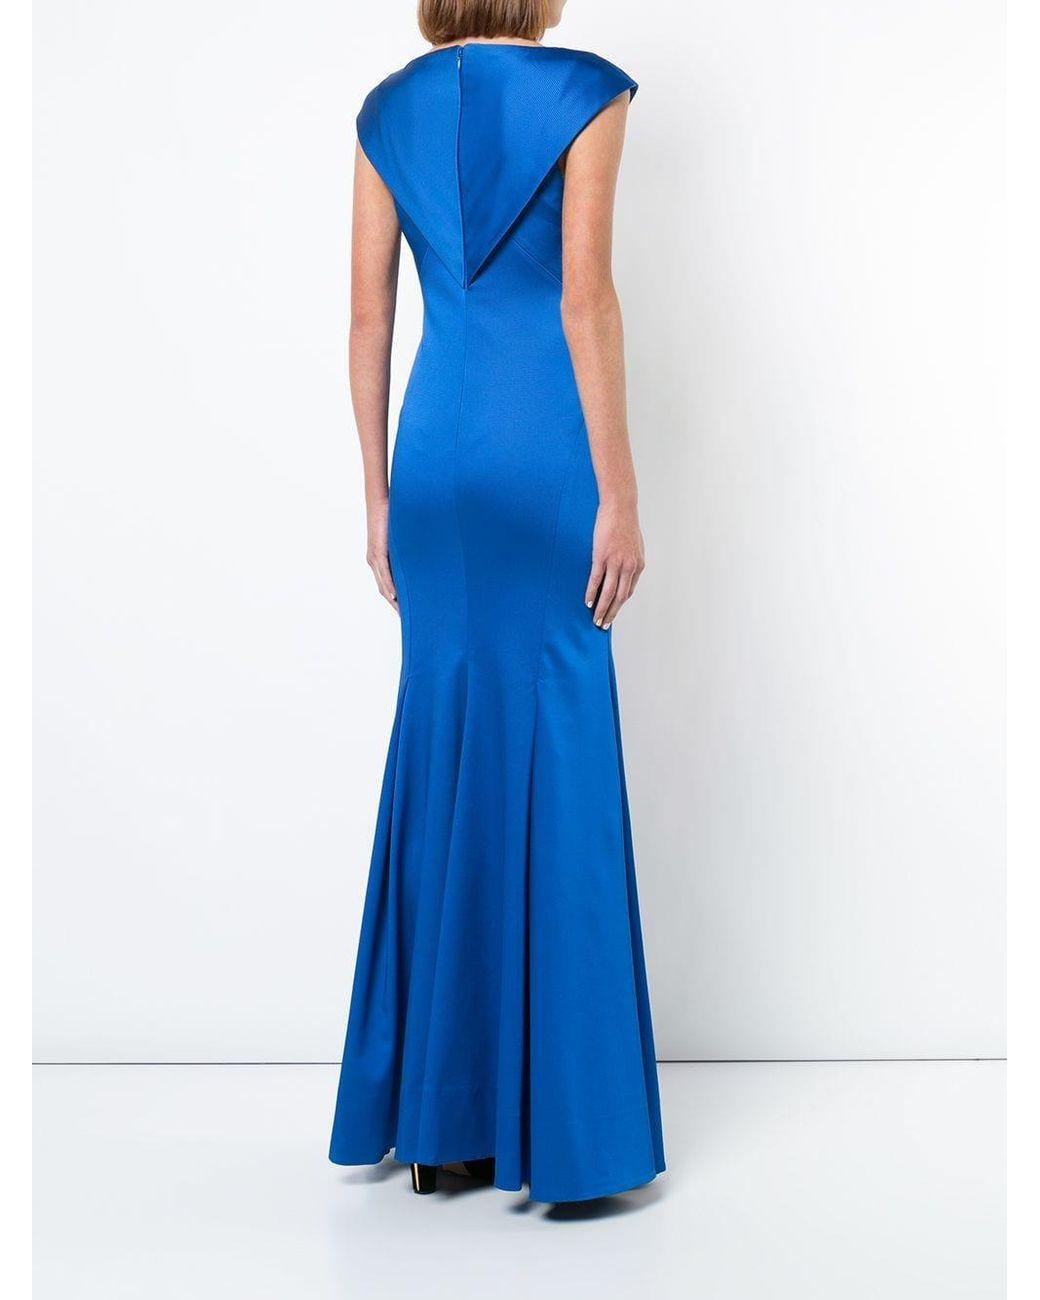 Abiti Da Sera Zac Posen.Zac Zac Posen Synthetic Nina Gown In Blue Lyst